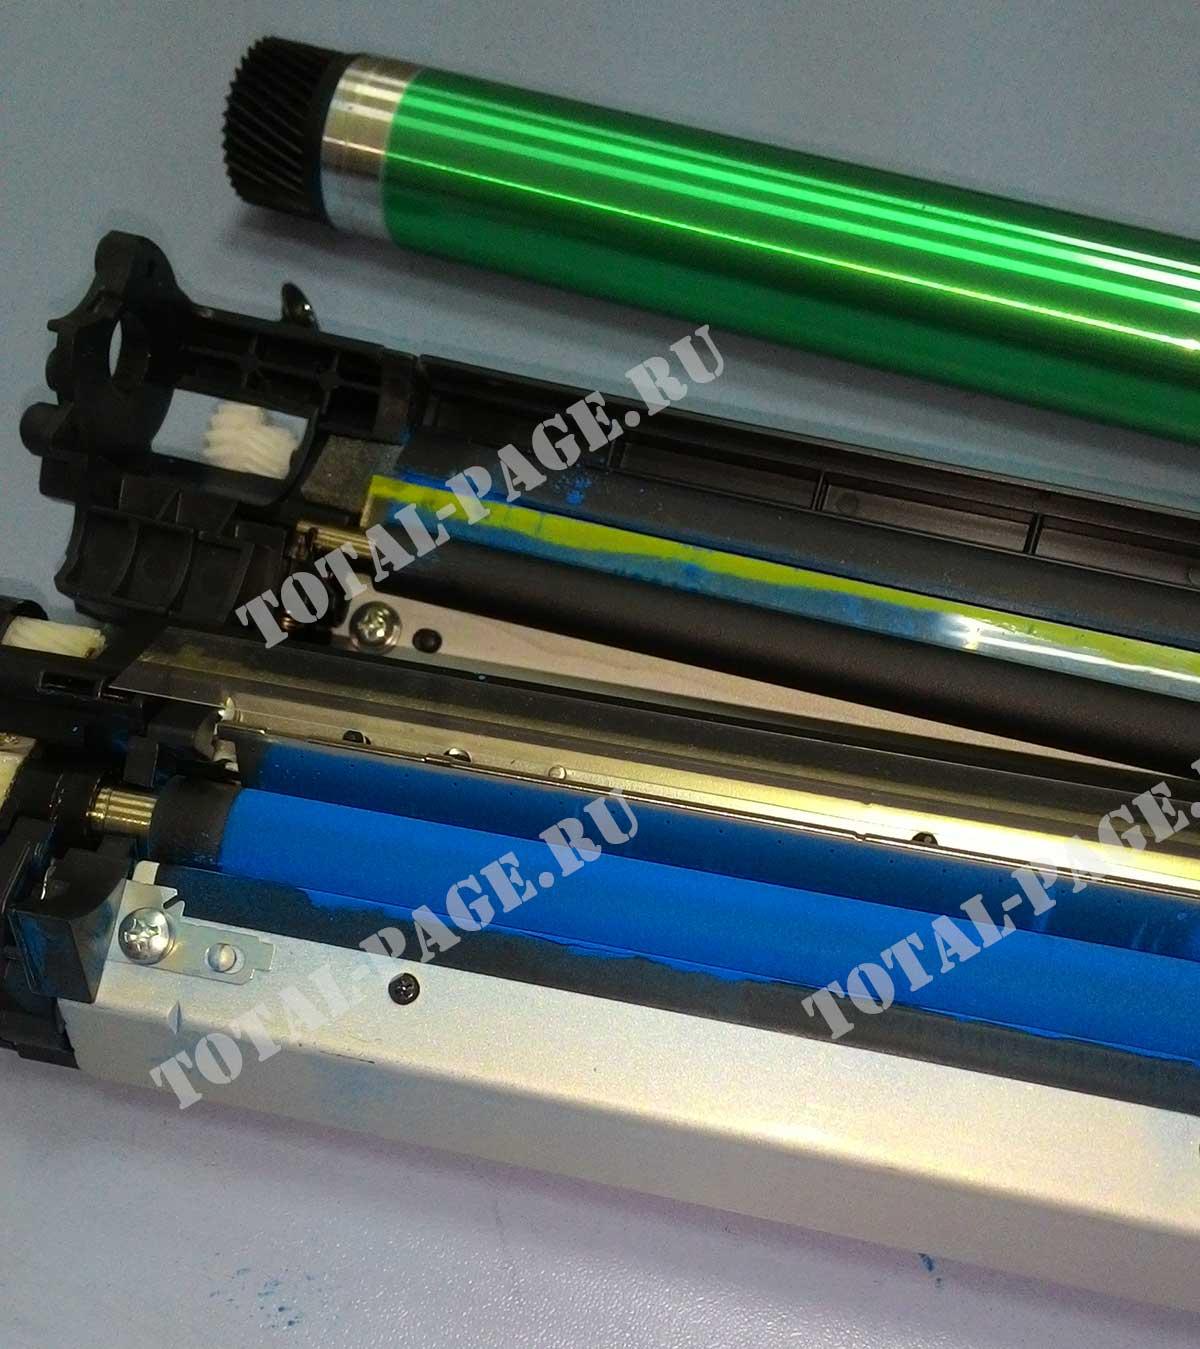 Minolta Magicolor 3730 про чипы и заправку.